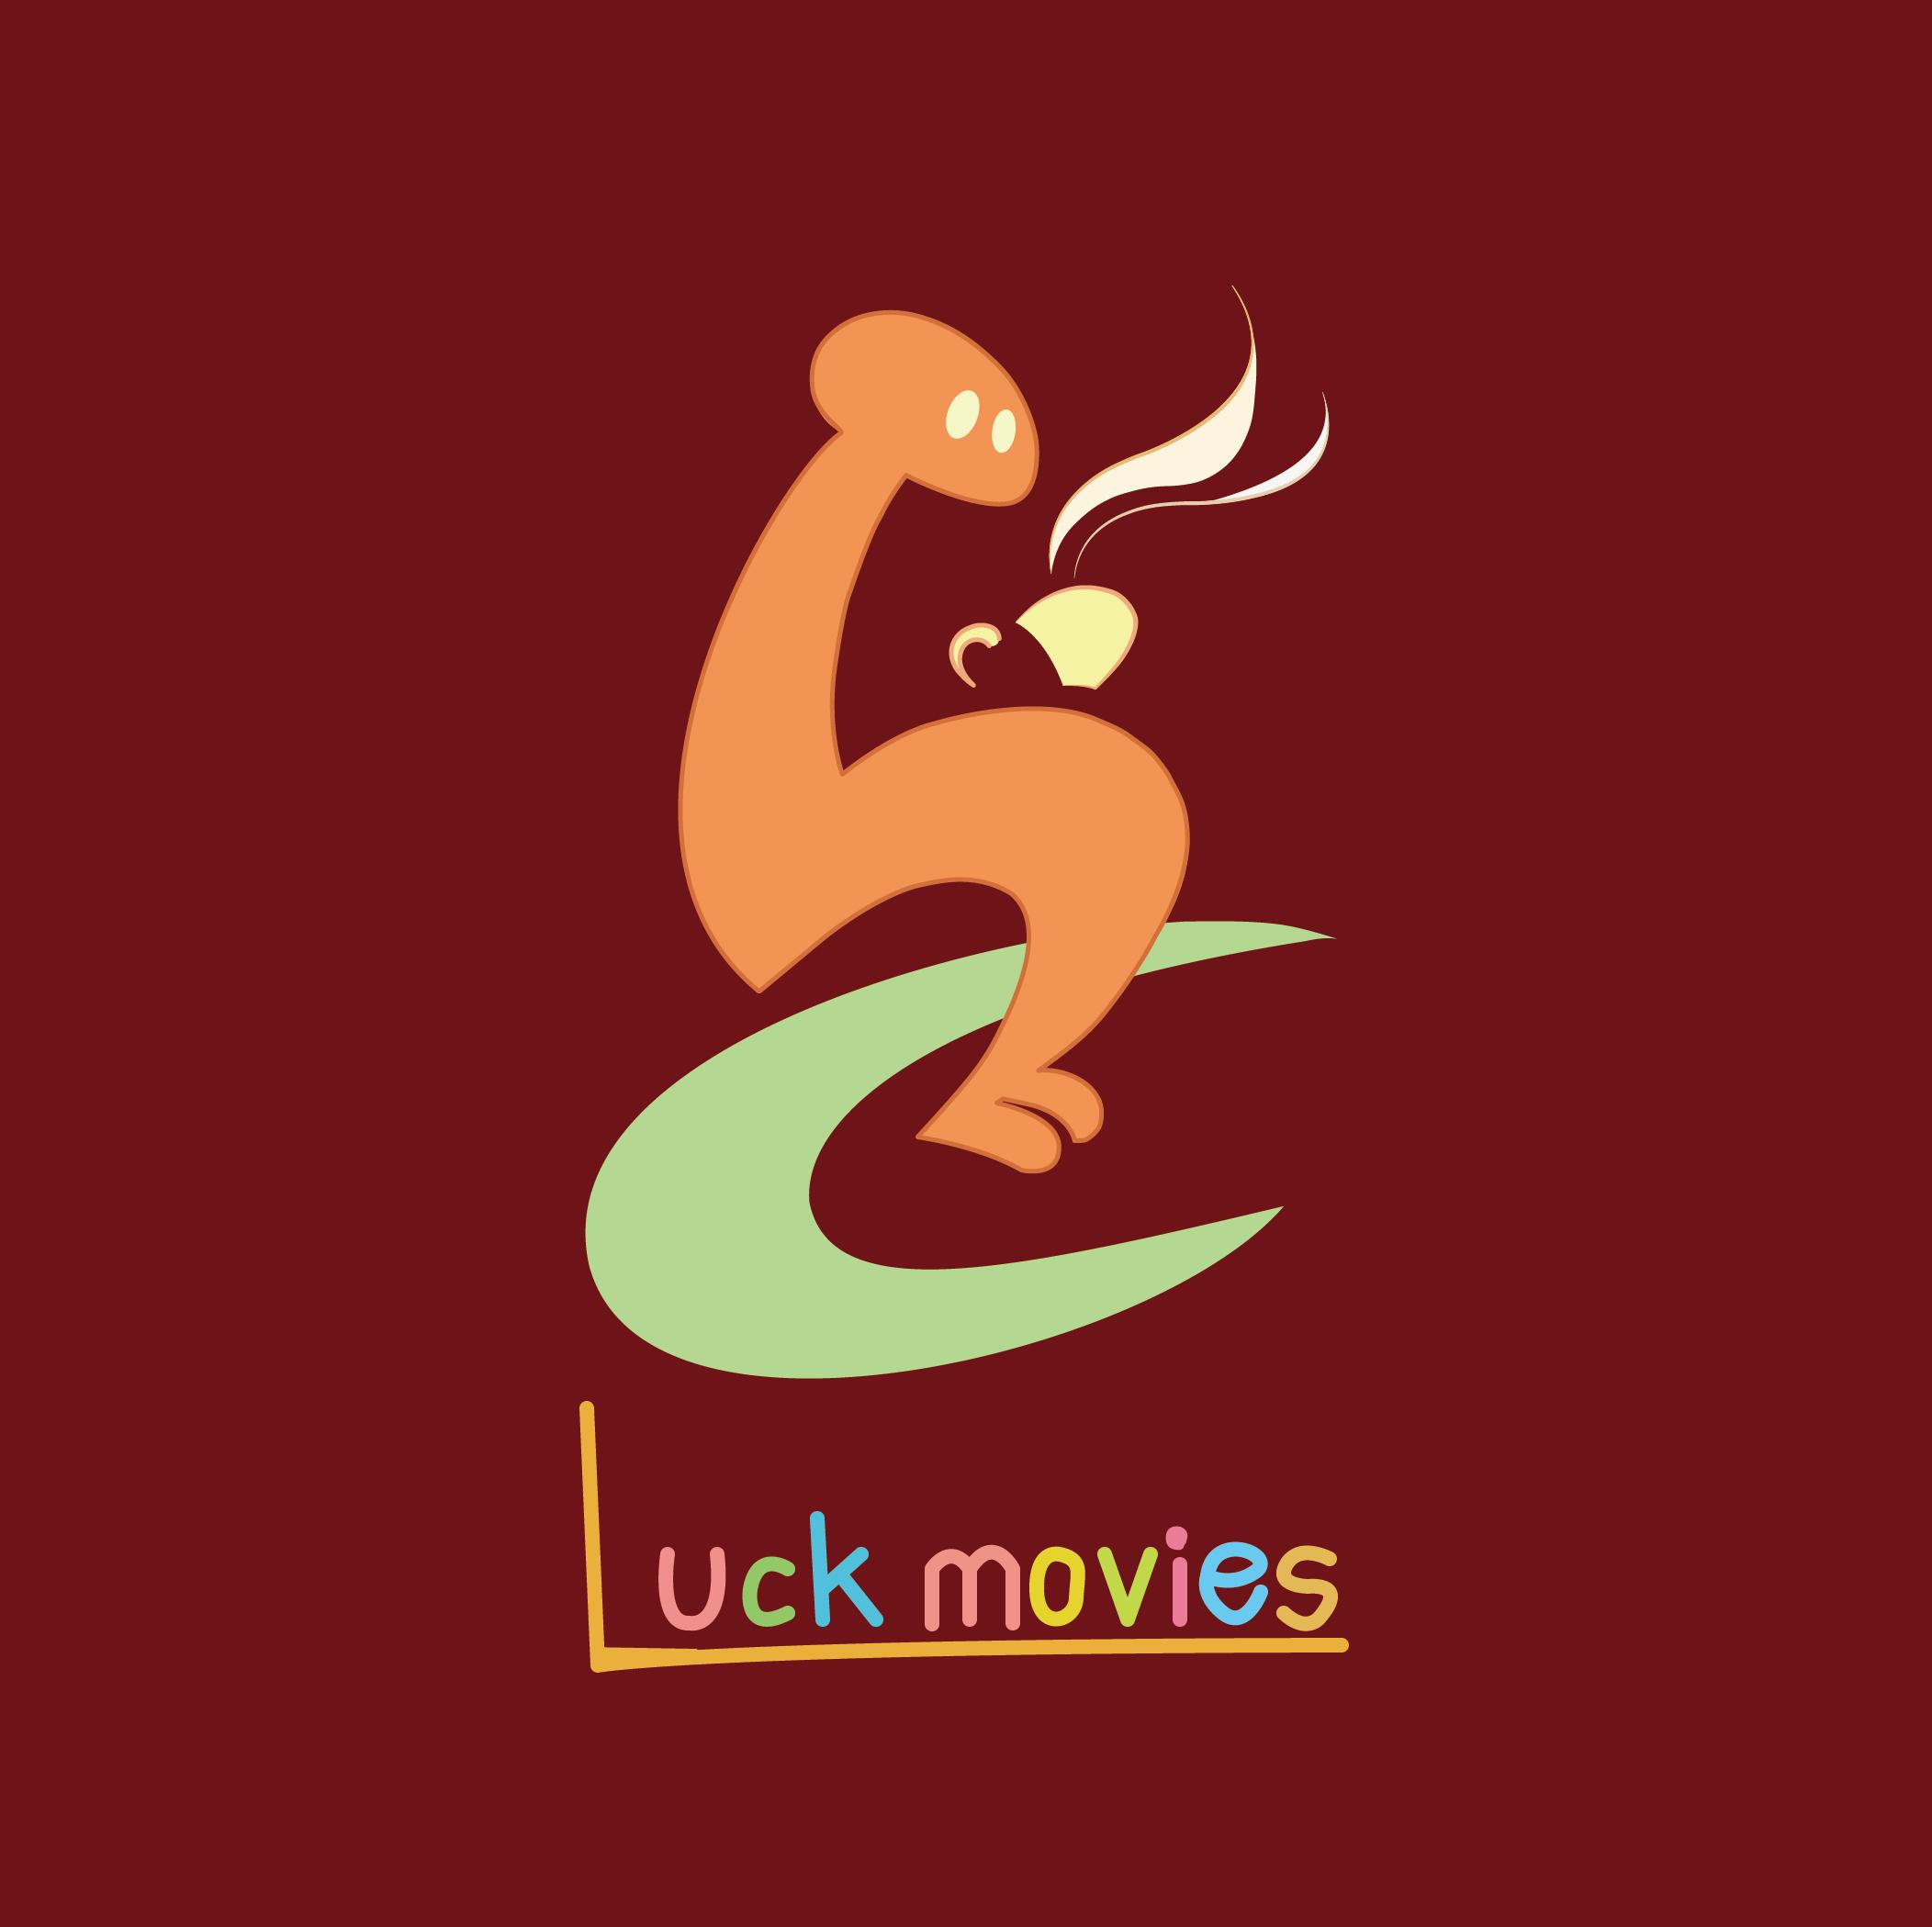 luck movies画像